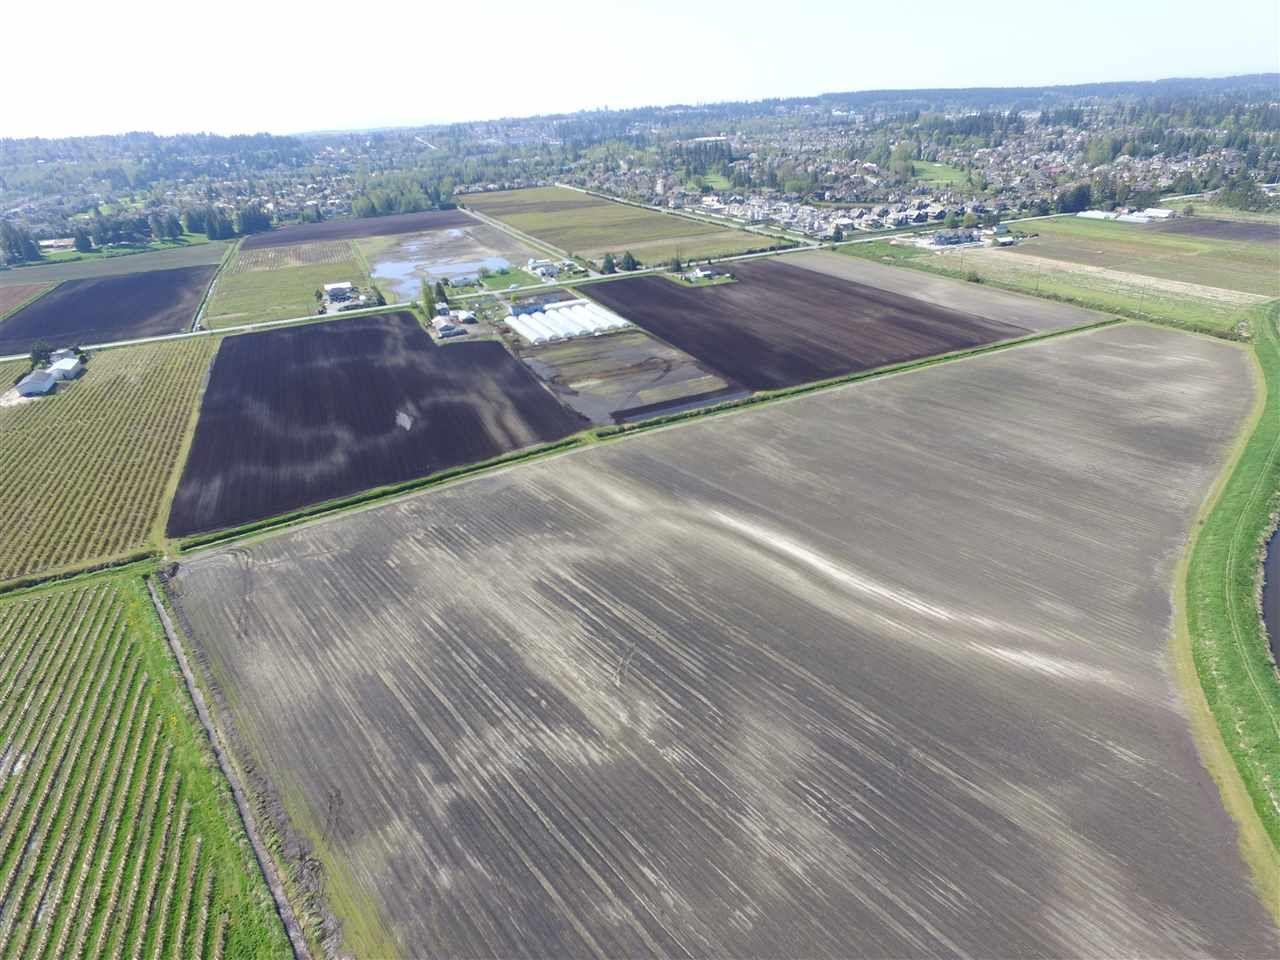 Photo 8: Photos: 16271 40 Avenue in Surrey: Serpentine Land for sale (Cloverdale)  : MLS®# R2335945